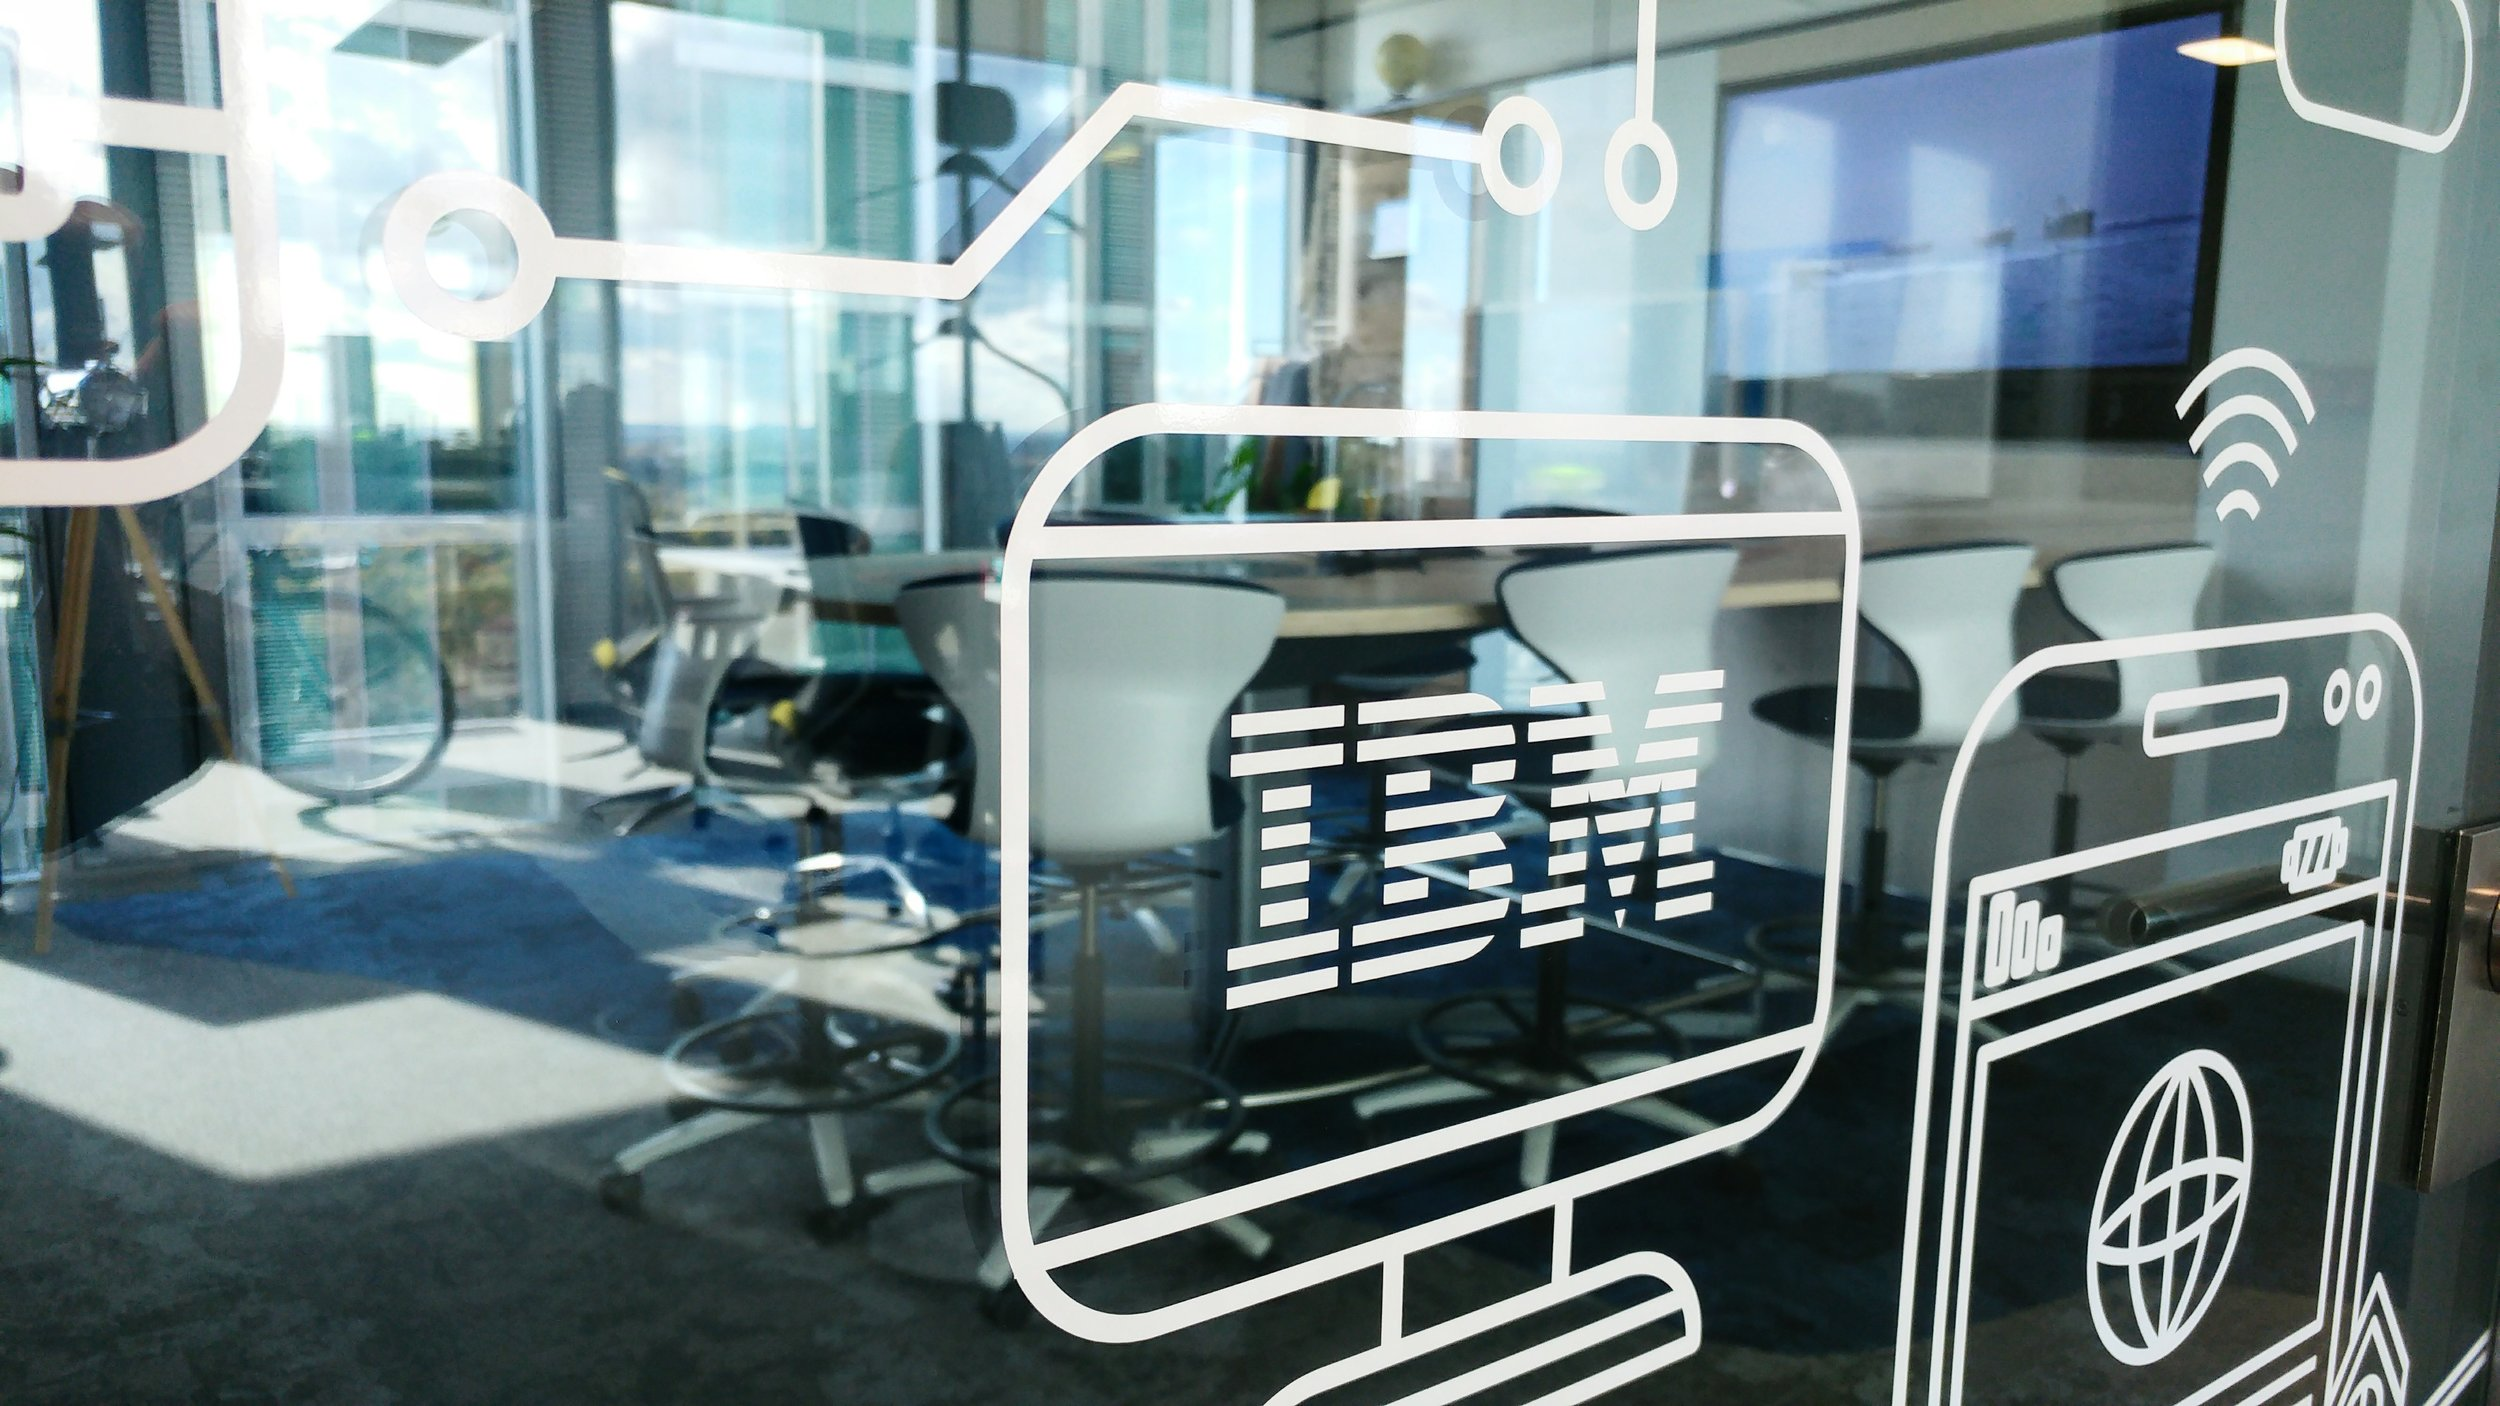 IBM-GeertSnijders.jpg